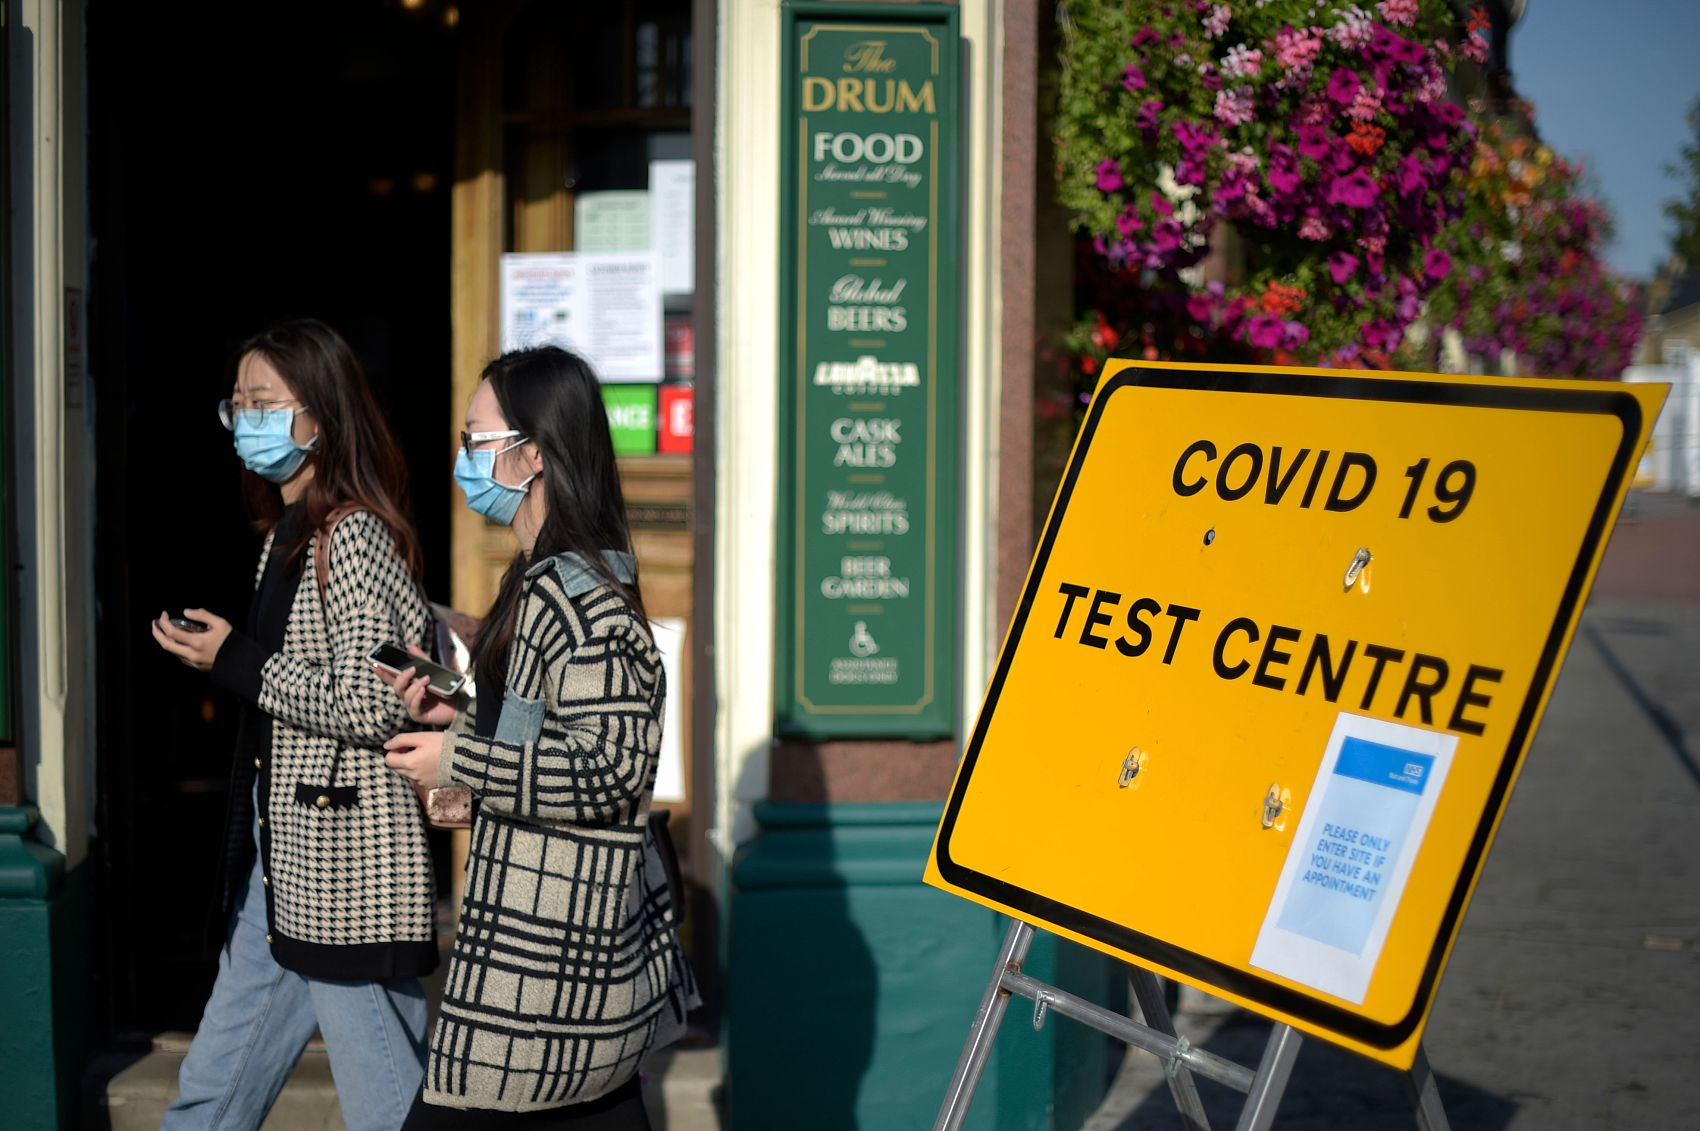 UK at coronavirus 'tipping point': health secretary